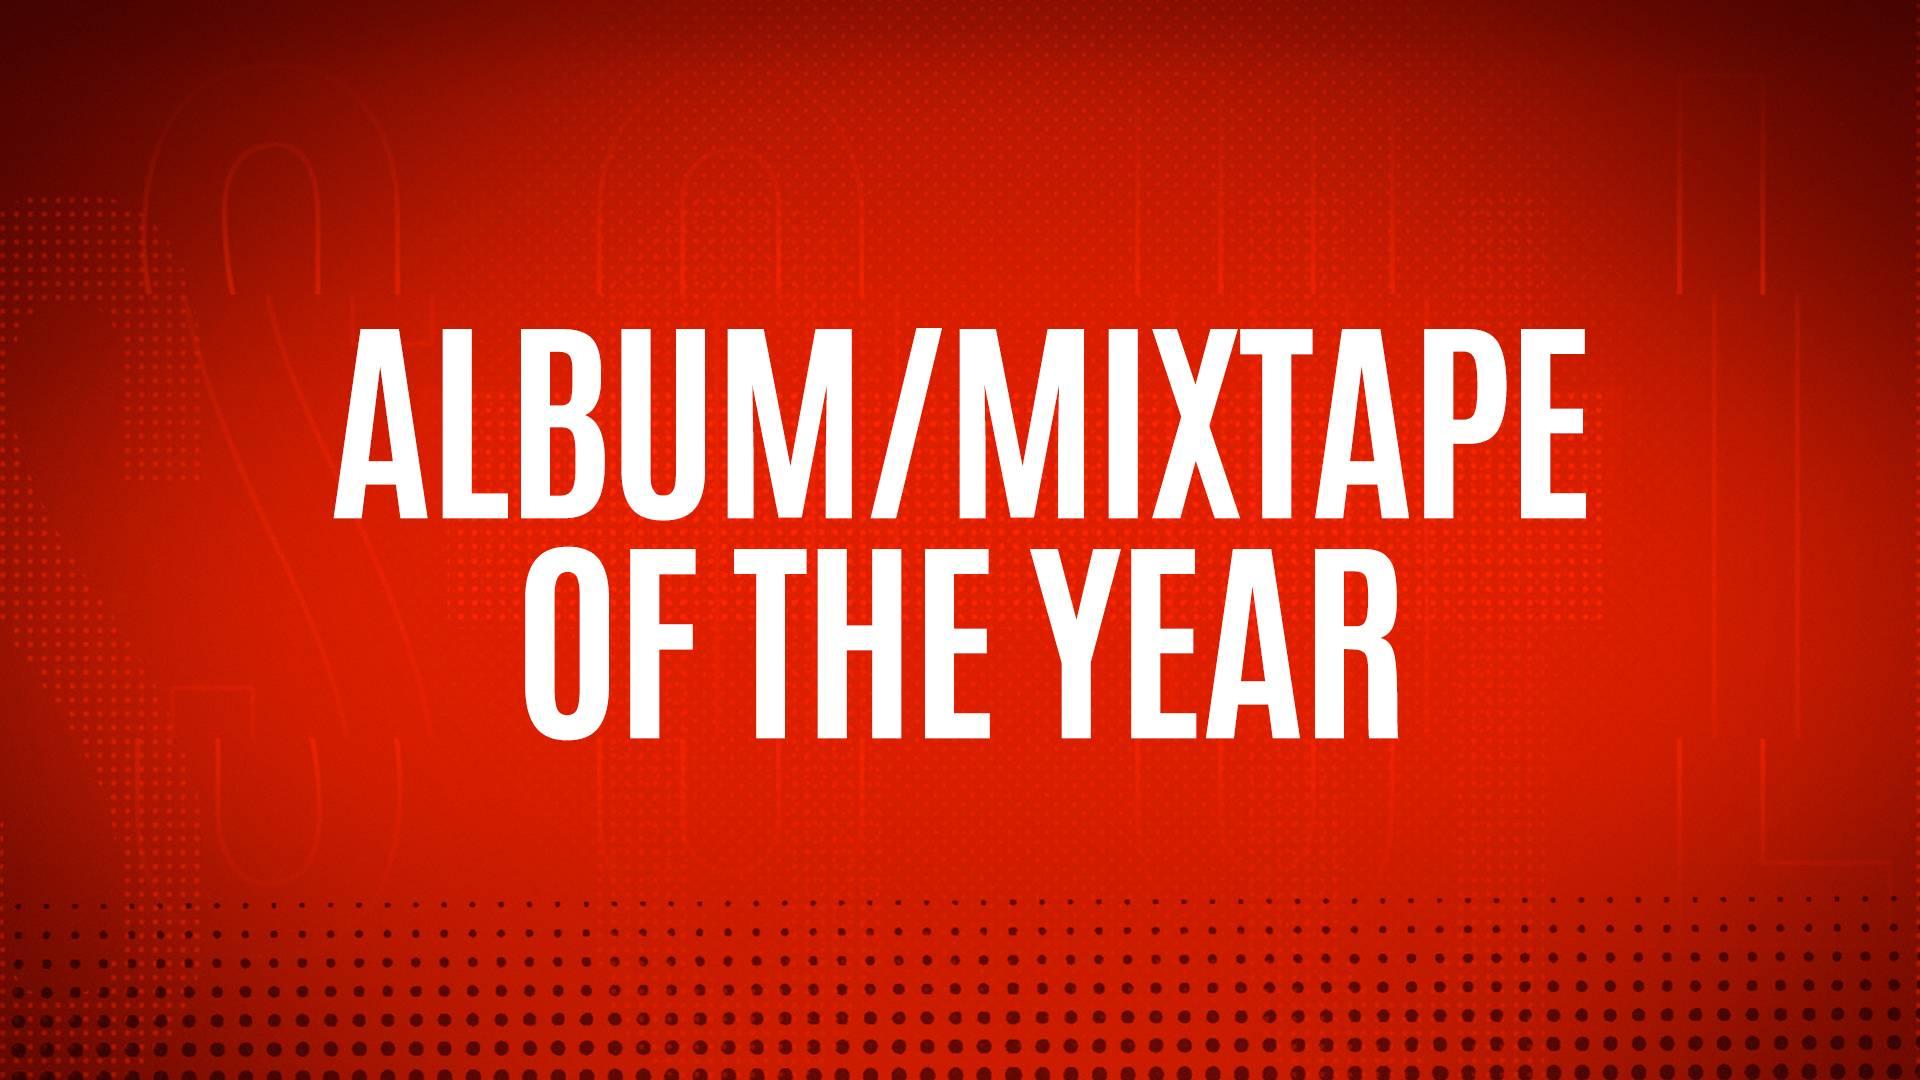 NOMINEES - ALBUM/ MIXTAPE OF THE YEAR